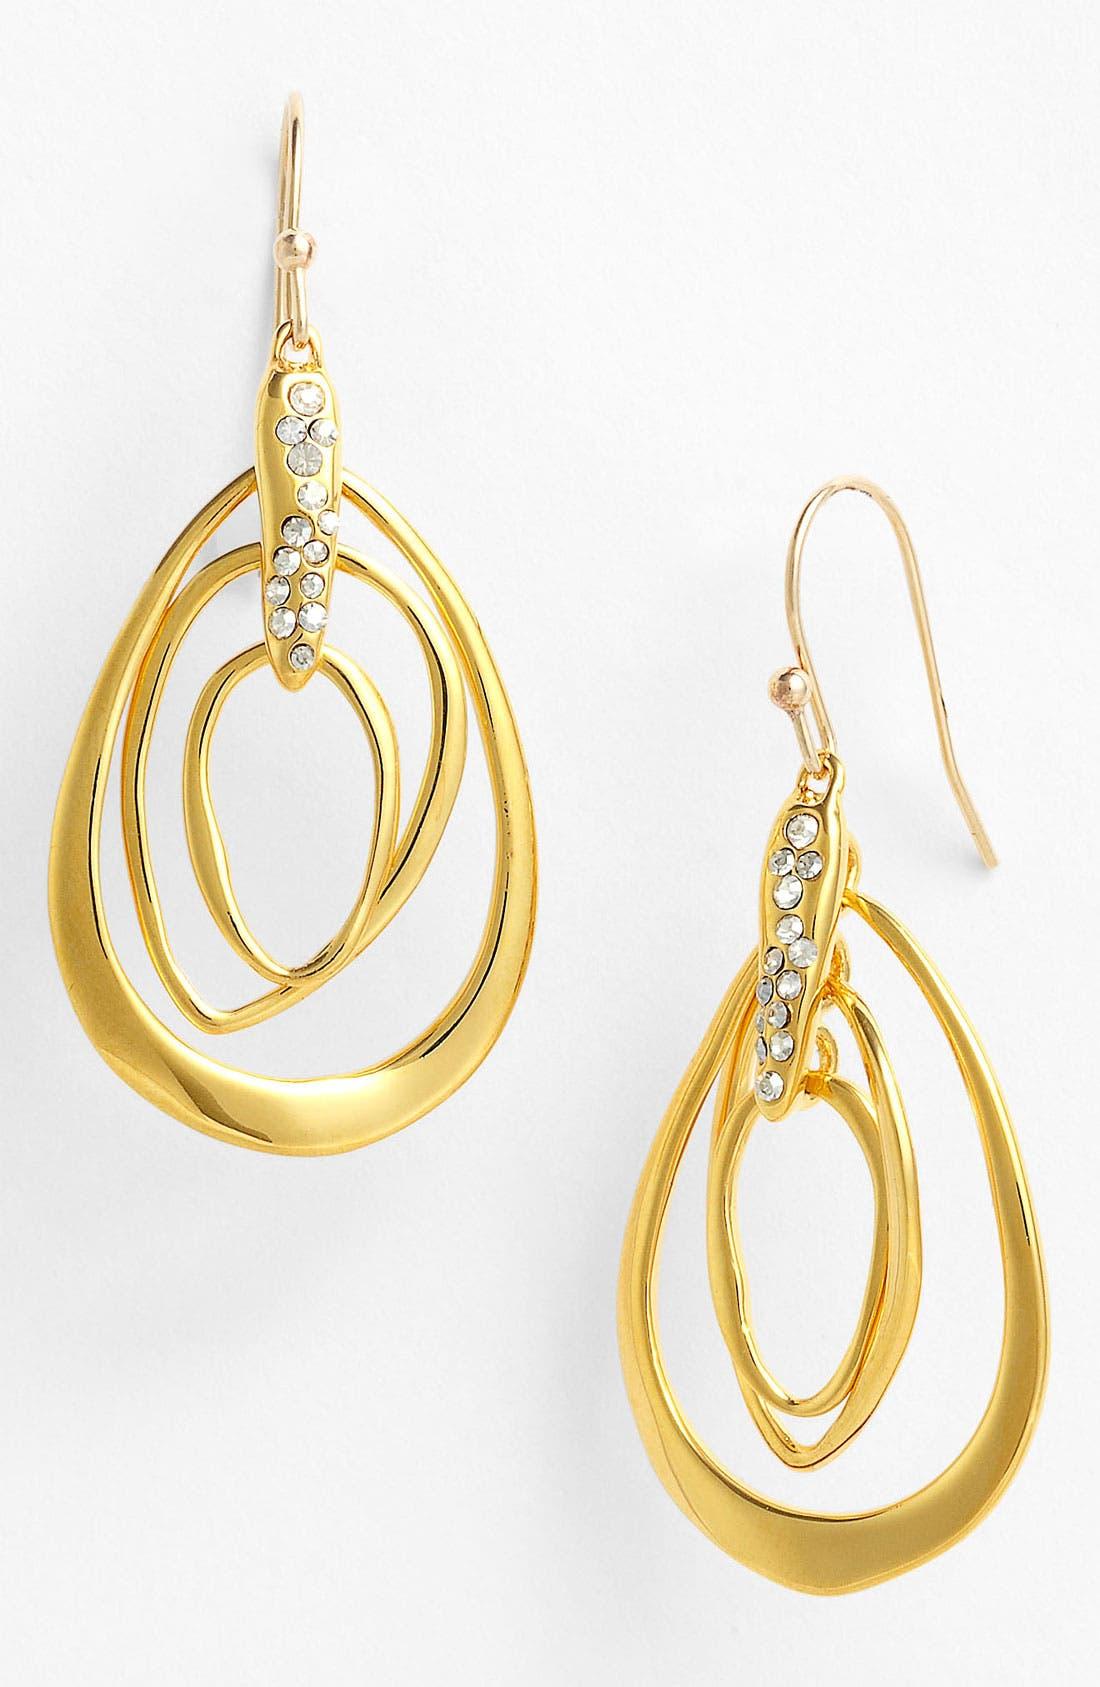 Main Image - Alexis Bittar 'Miss Havisham - New Wave' Orbiting Link Earrings